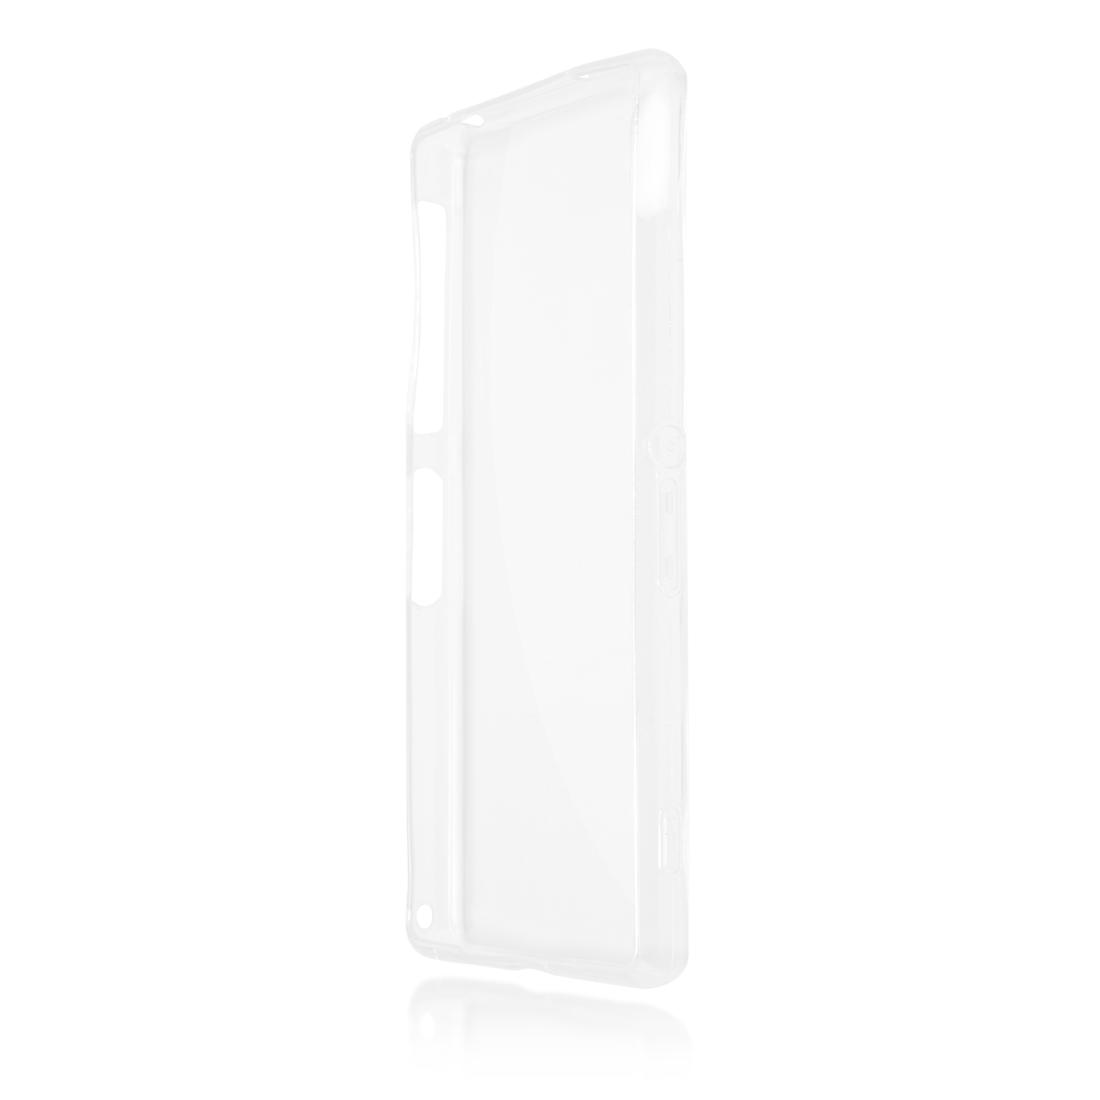 Силиконовый чехол Brosco для Sony Xperia Z2, прозрачный